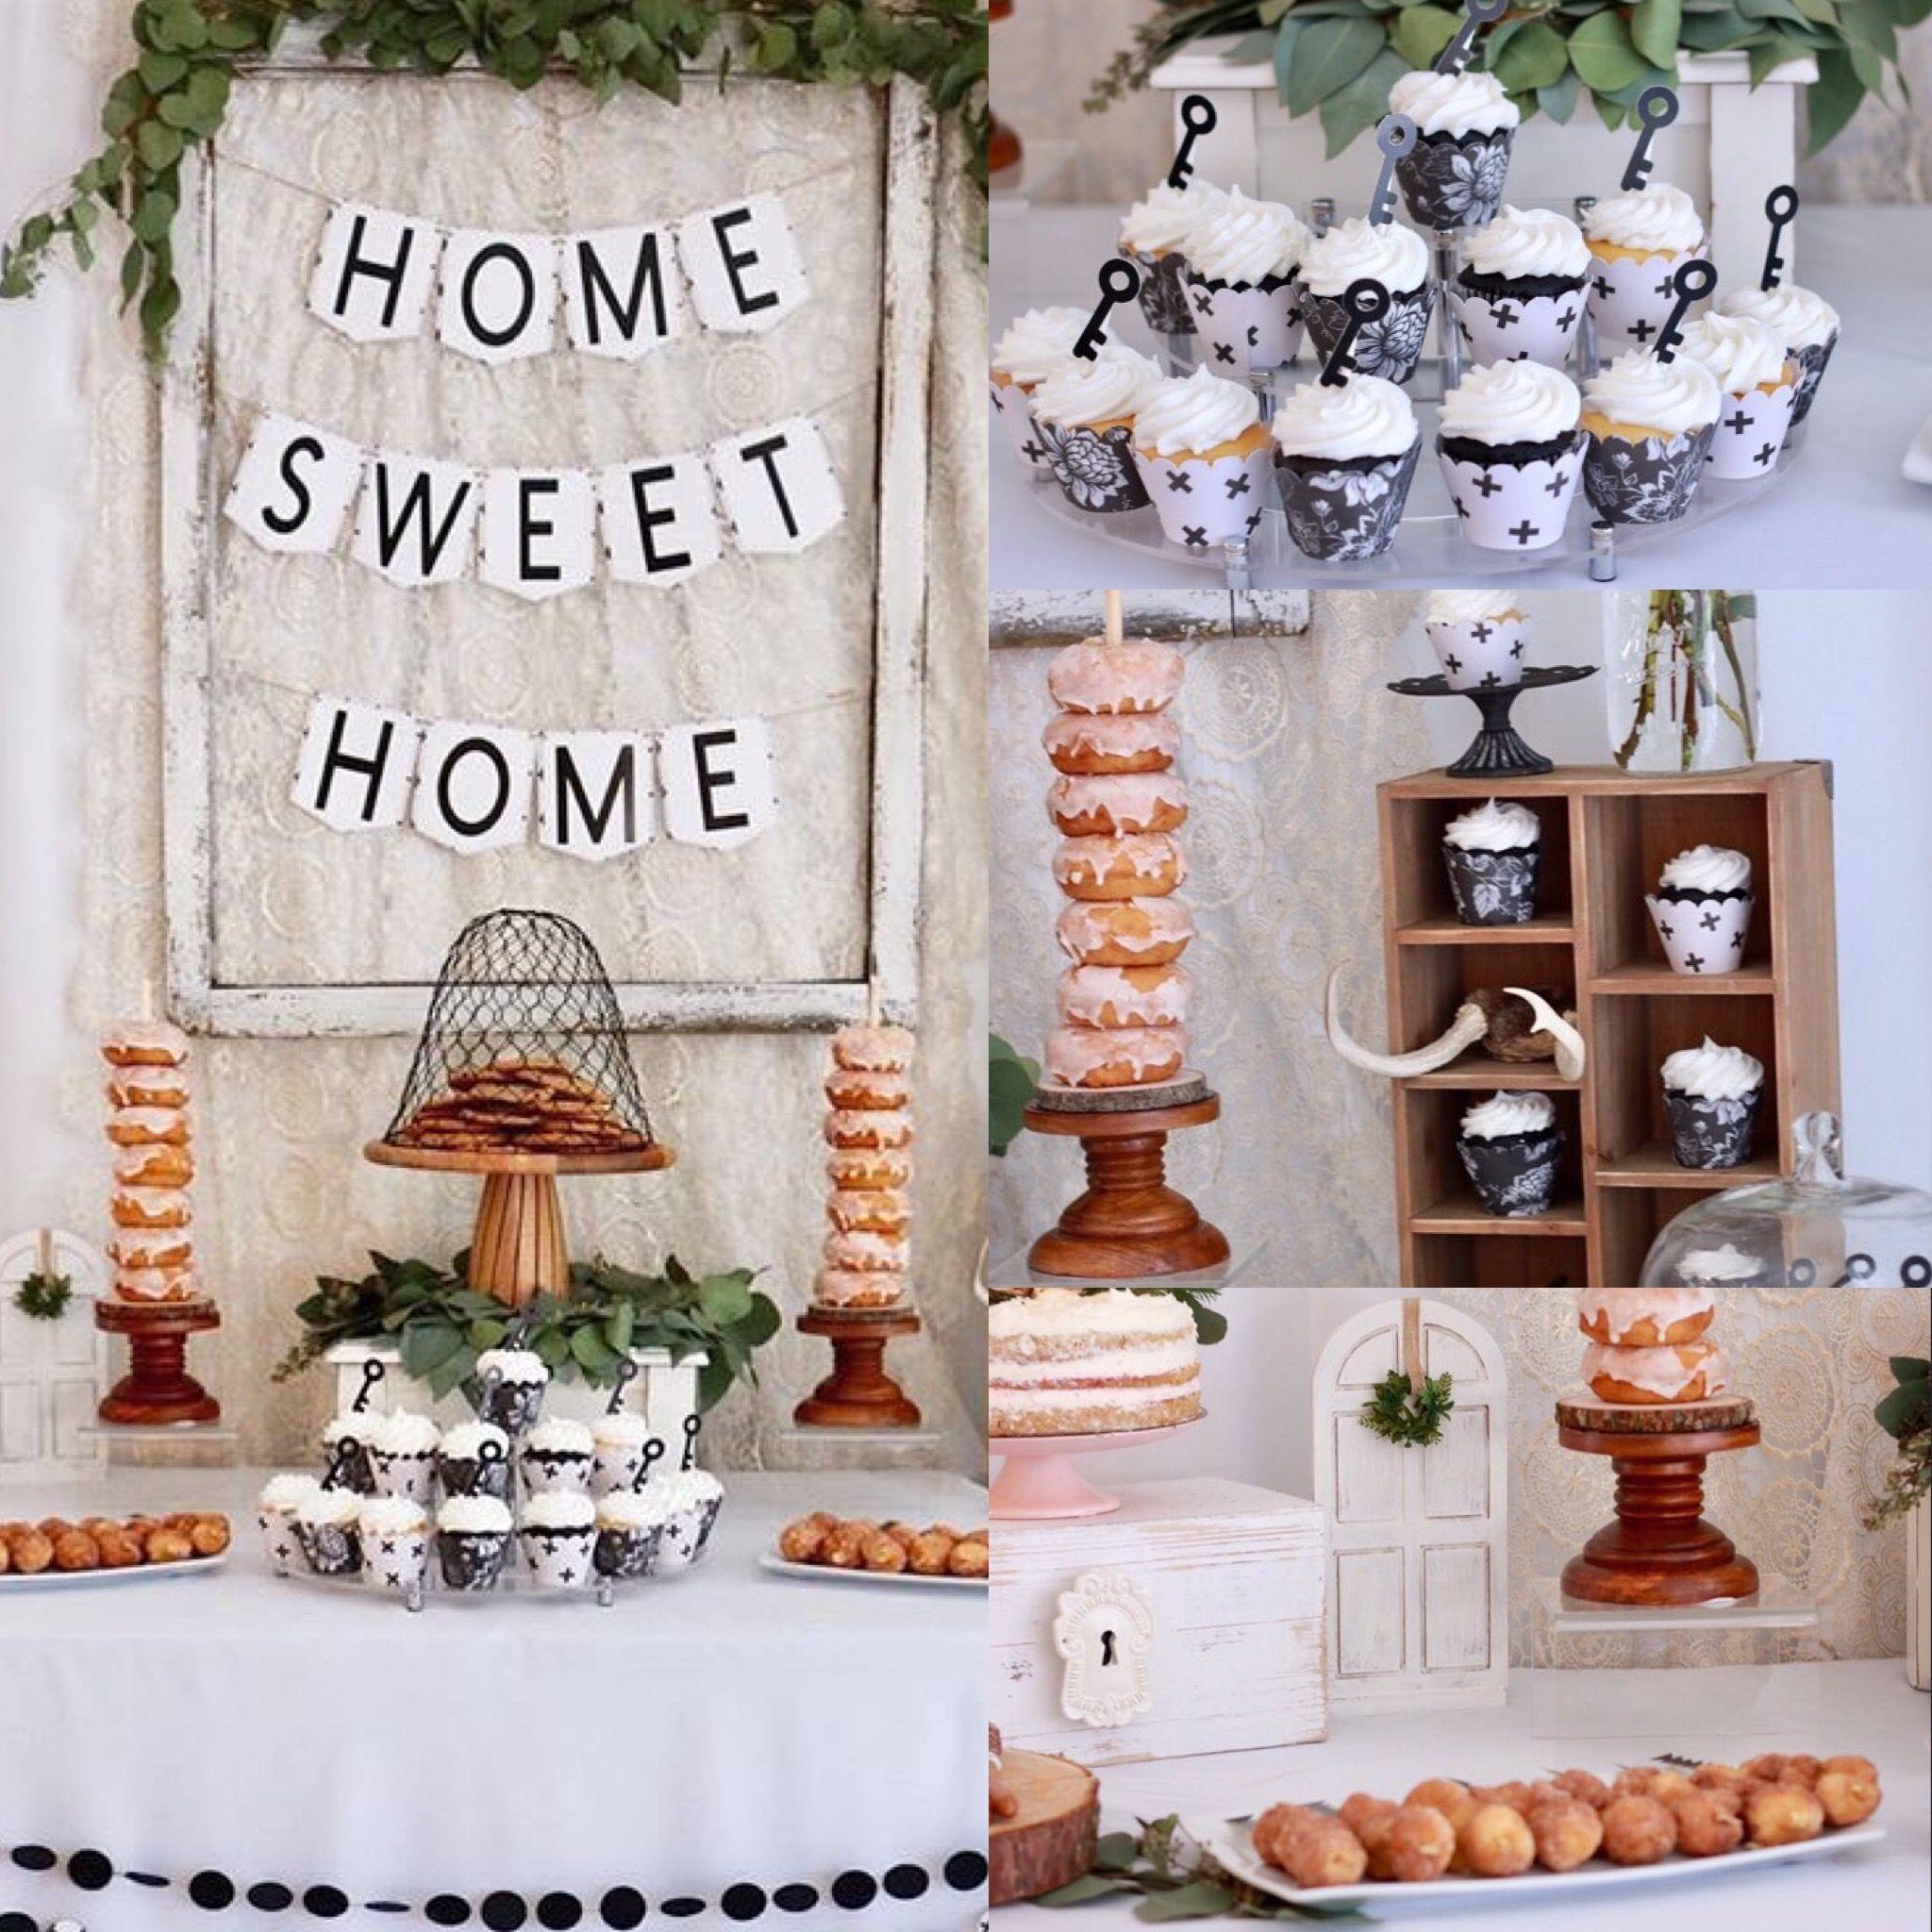 Home sweet home,housewarming,housewarming party,new home,our first home,  new home,home sweet home banner, housewarming decor